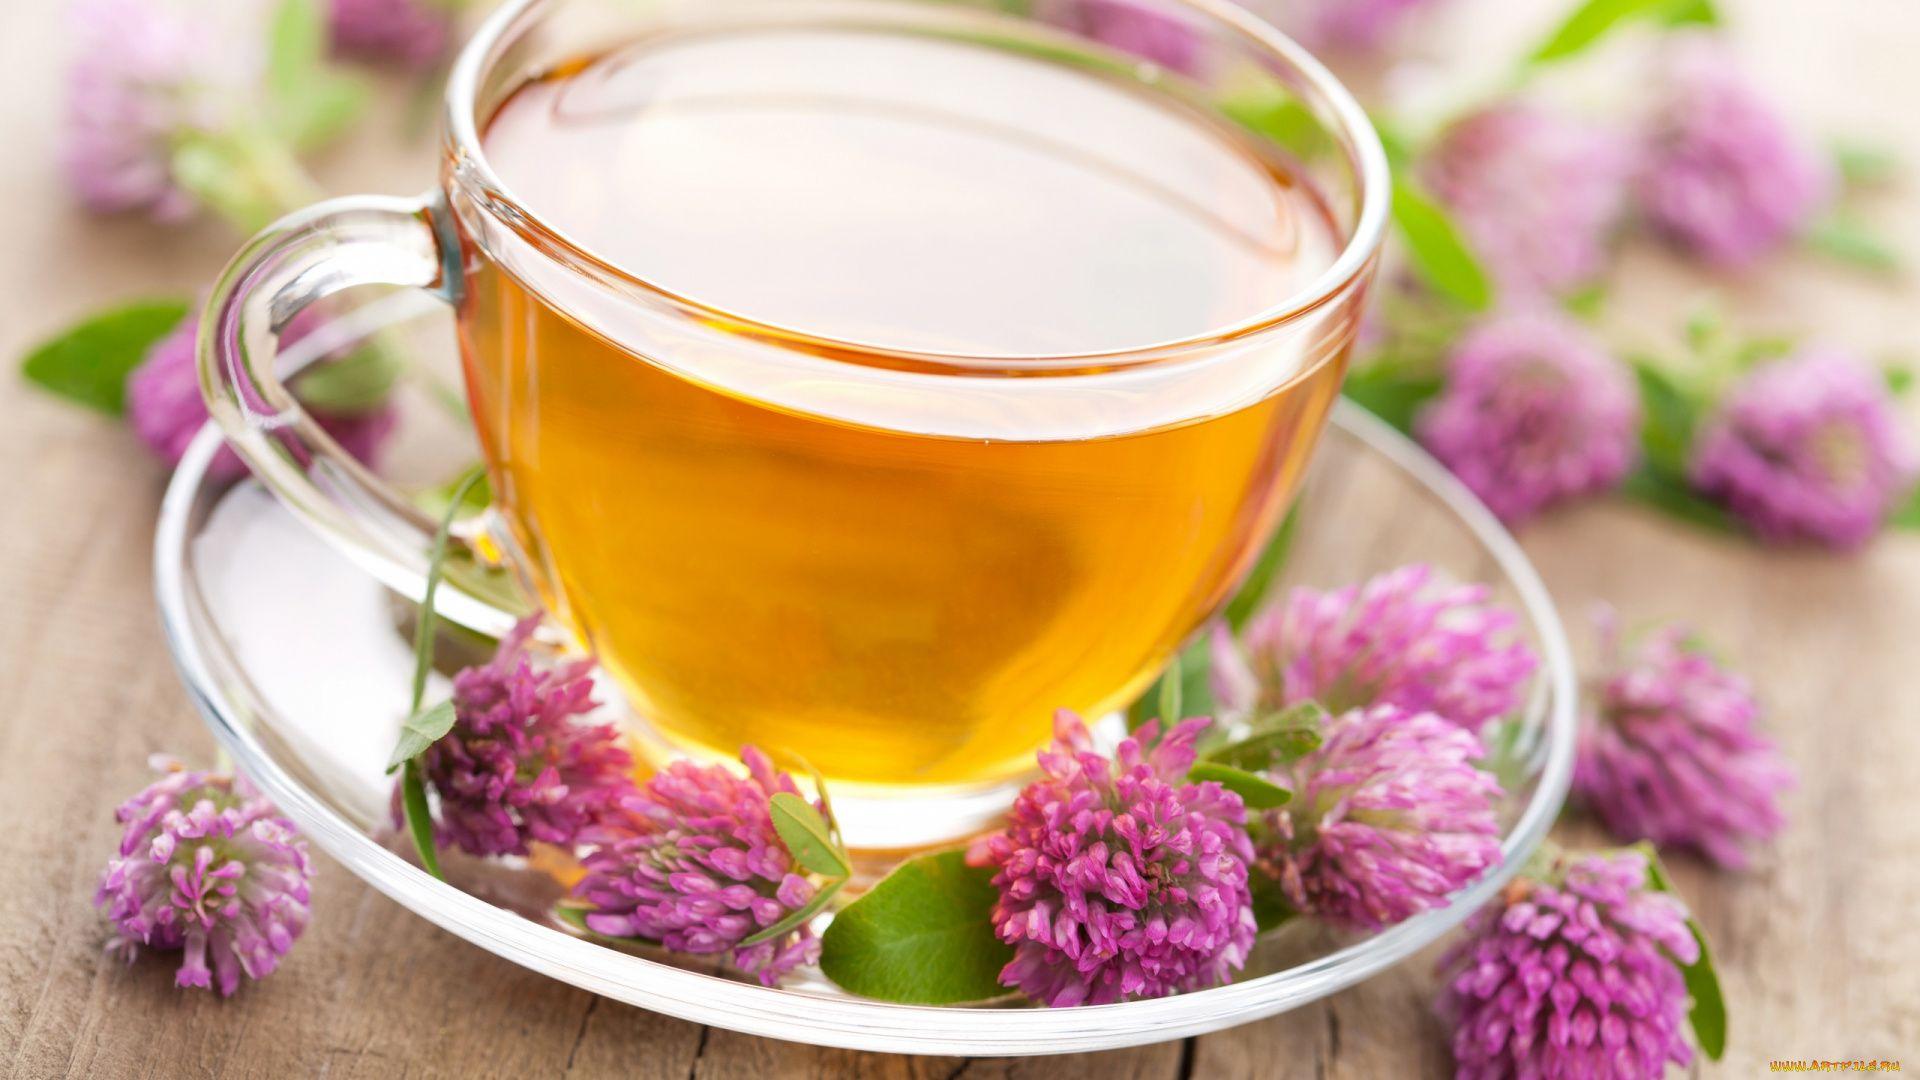 Tea picture image